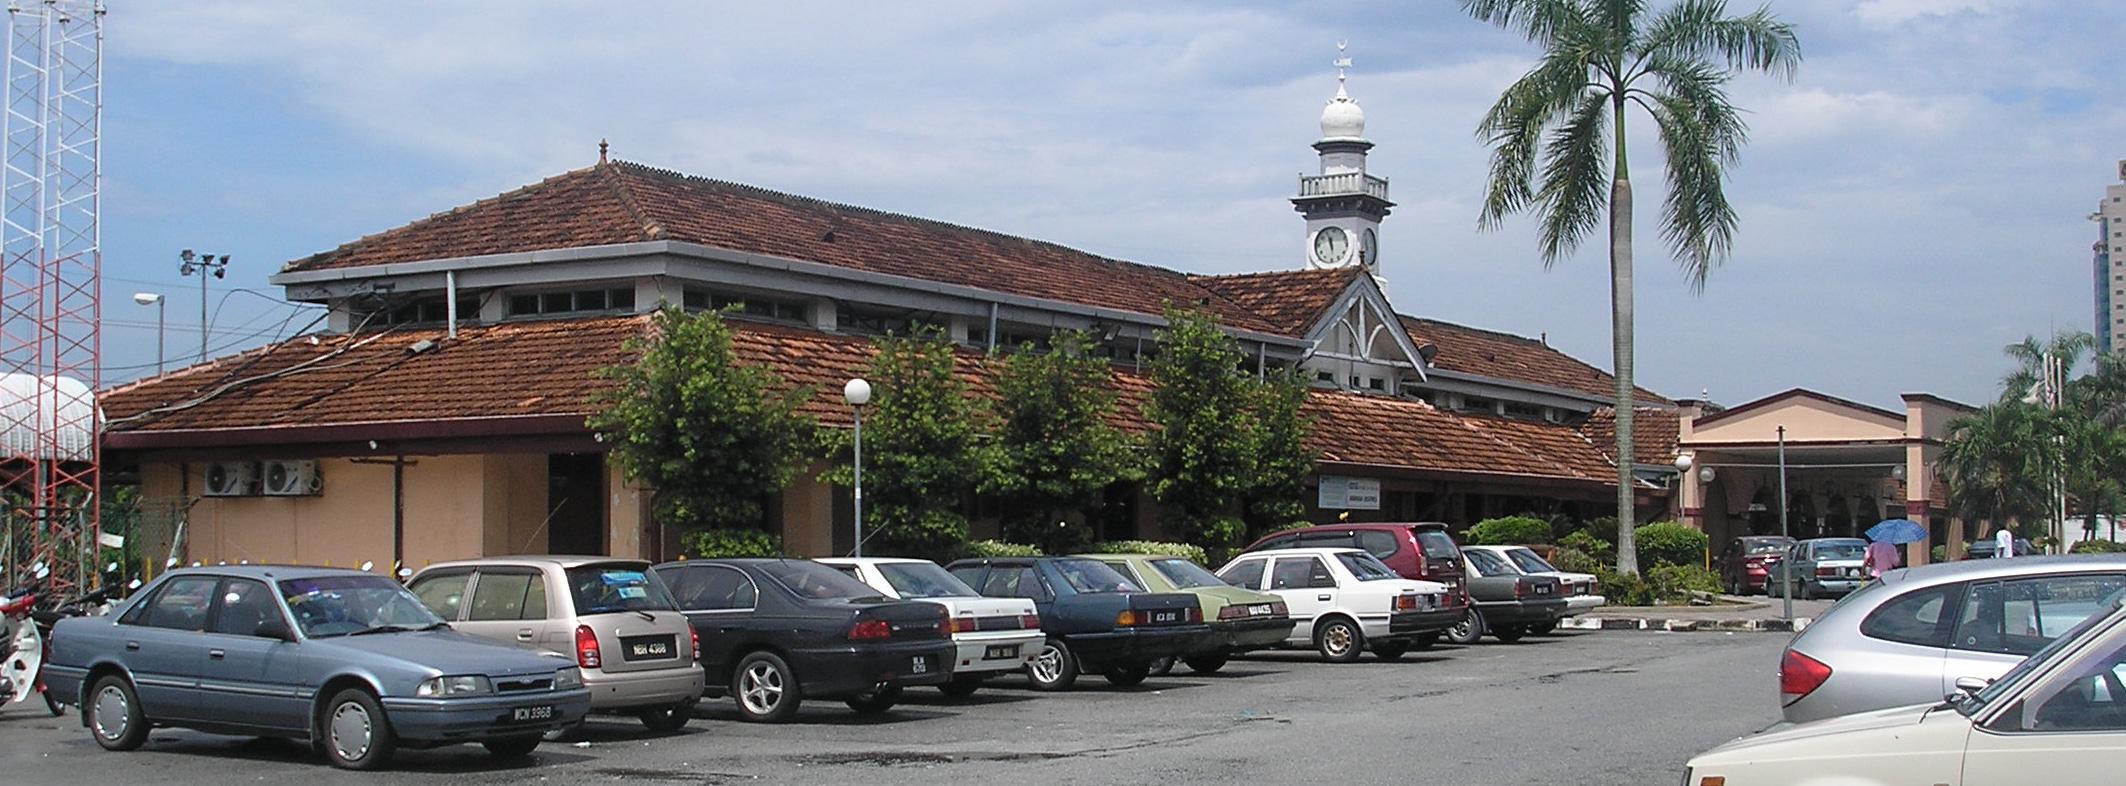 Seremban railway station. Photo taken on March 17, 2007.